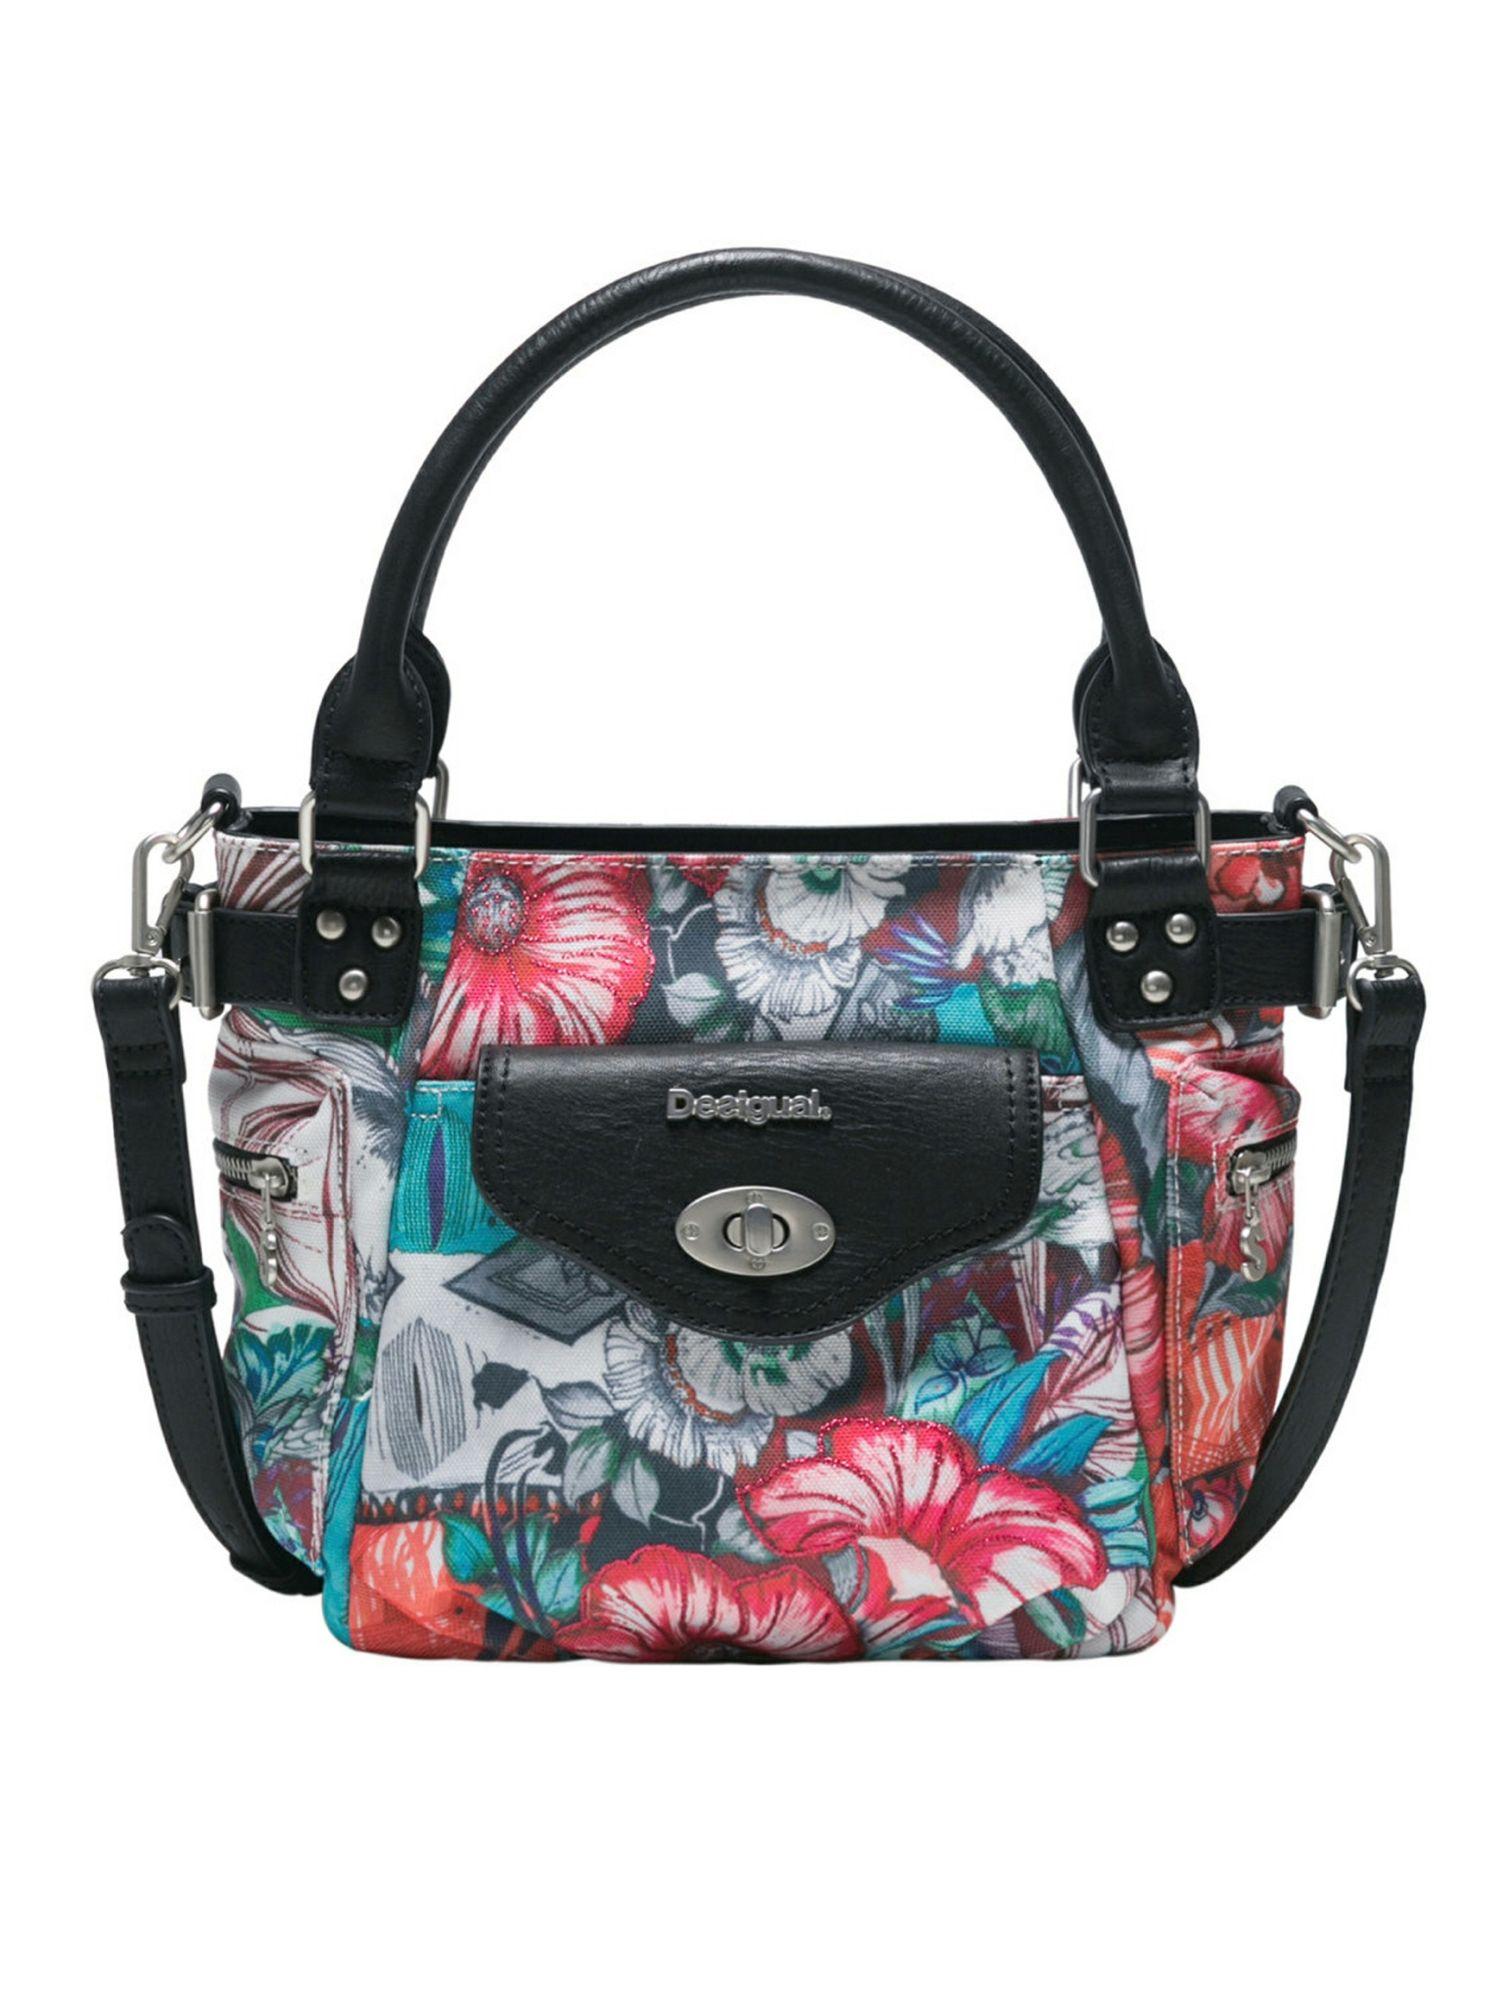 25cb245a7487a Desigual Handtasche Tasche YANDI MCBEE MINI Mehrfarbig 18SAXF90-5013 1 ...